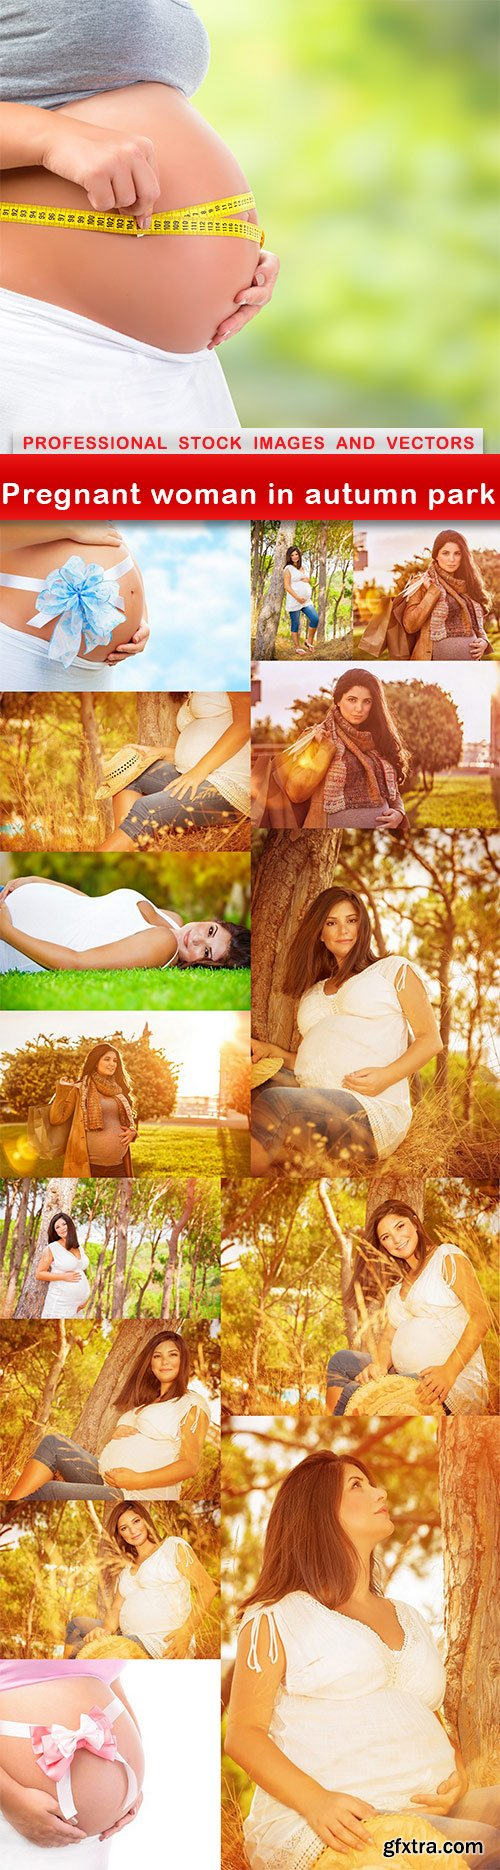 Pregnant woman in autumn park - 15 UHQ JPEG